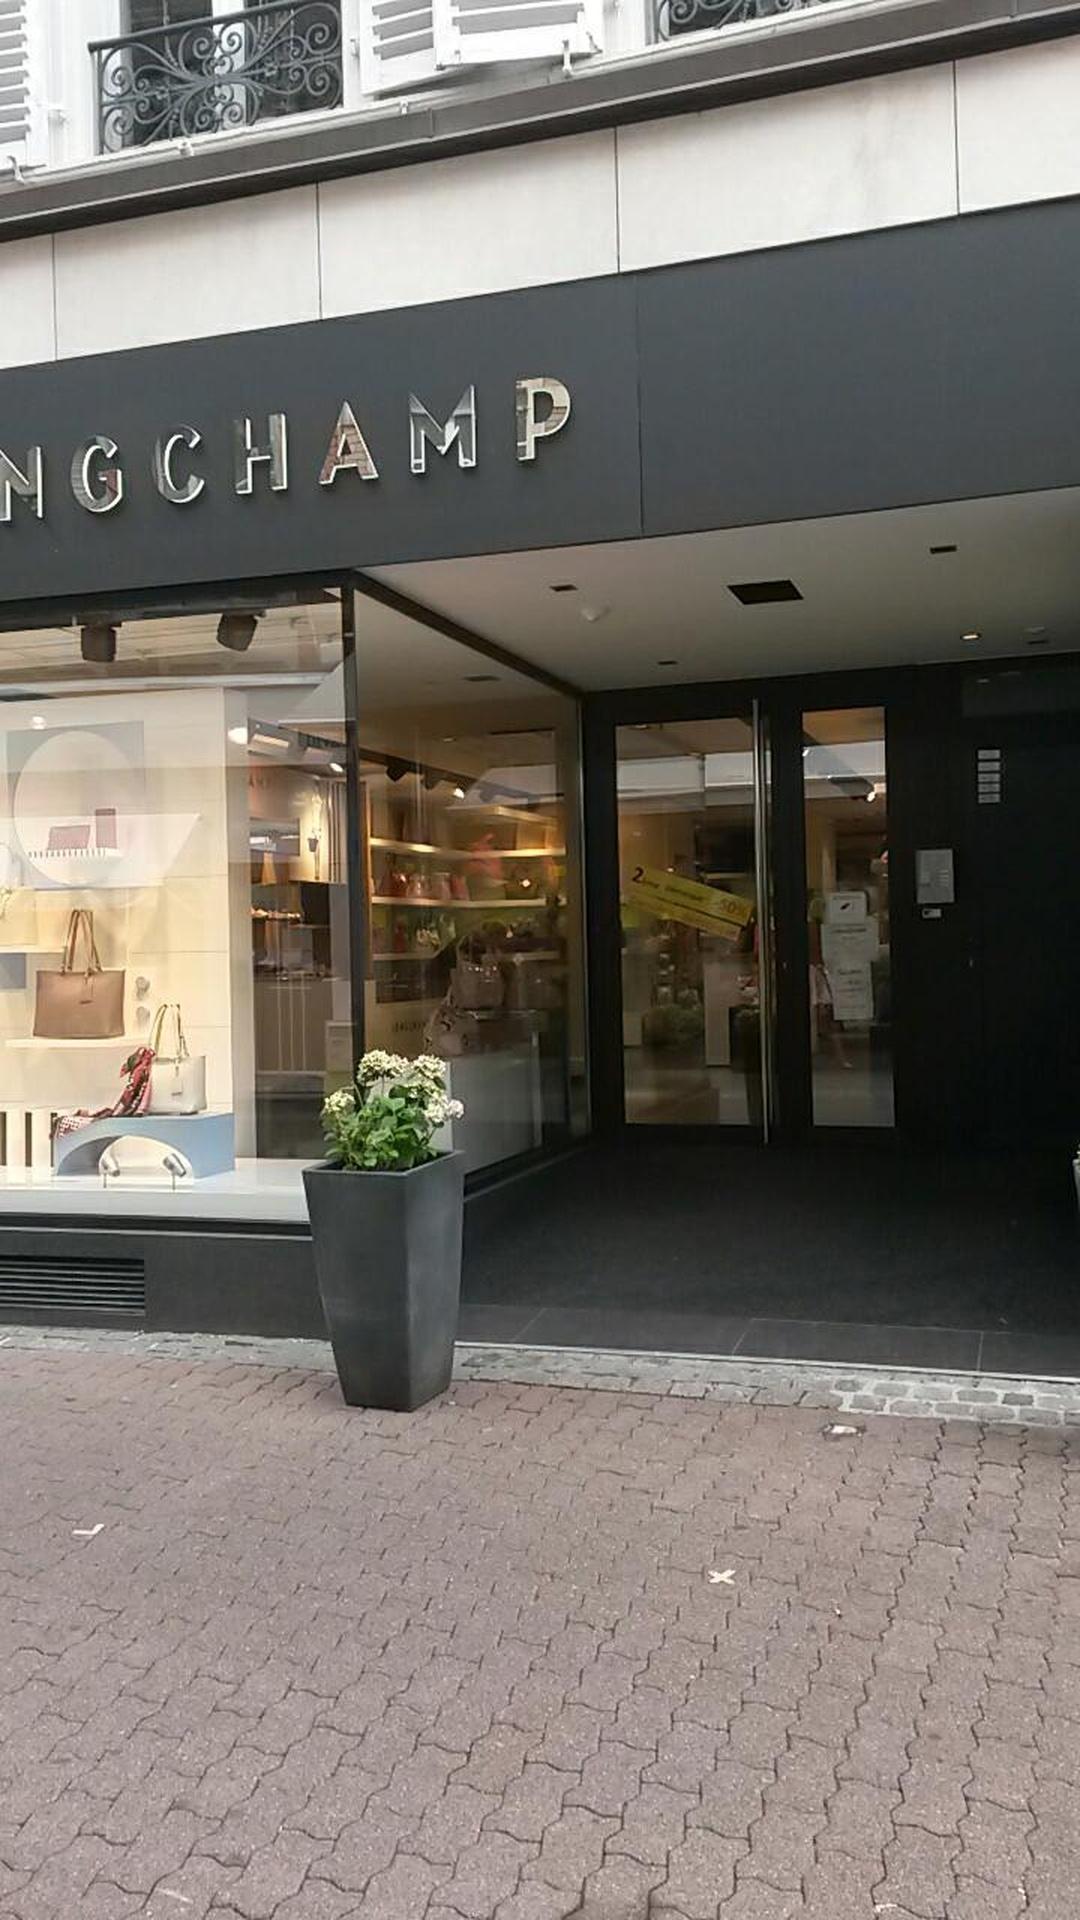 Foto vom 5. Februar 2016 18:57, Longchamp, 24 Rue des Boulangers, 68100 Mulhouse, Frankreich